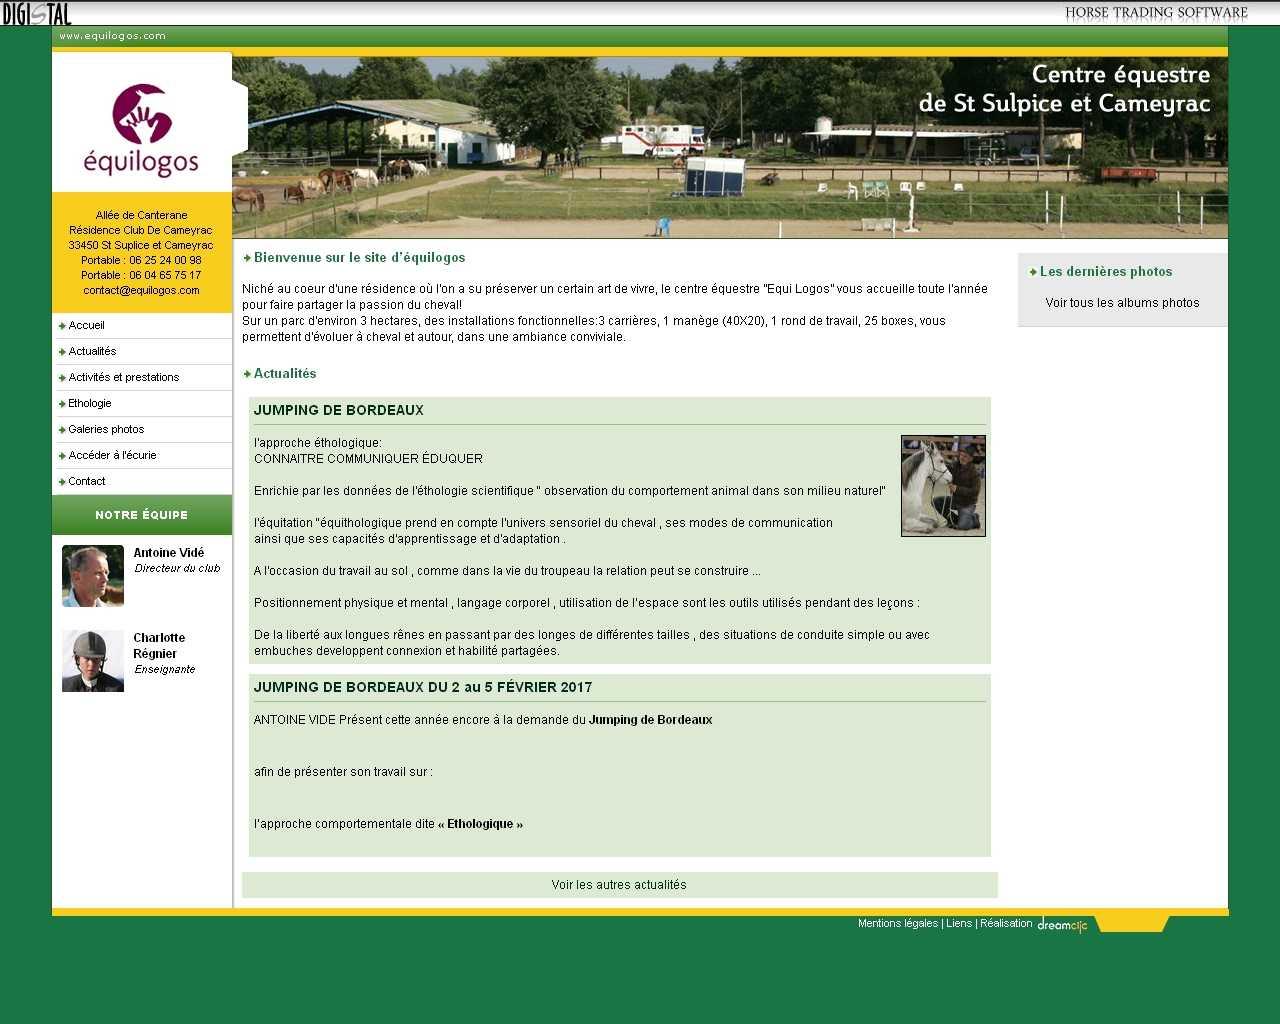 Visuel du site Equi Logos